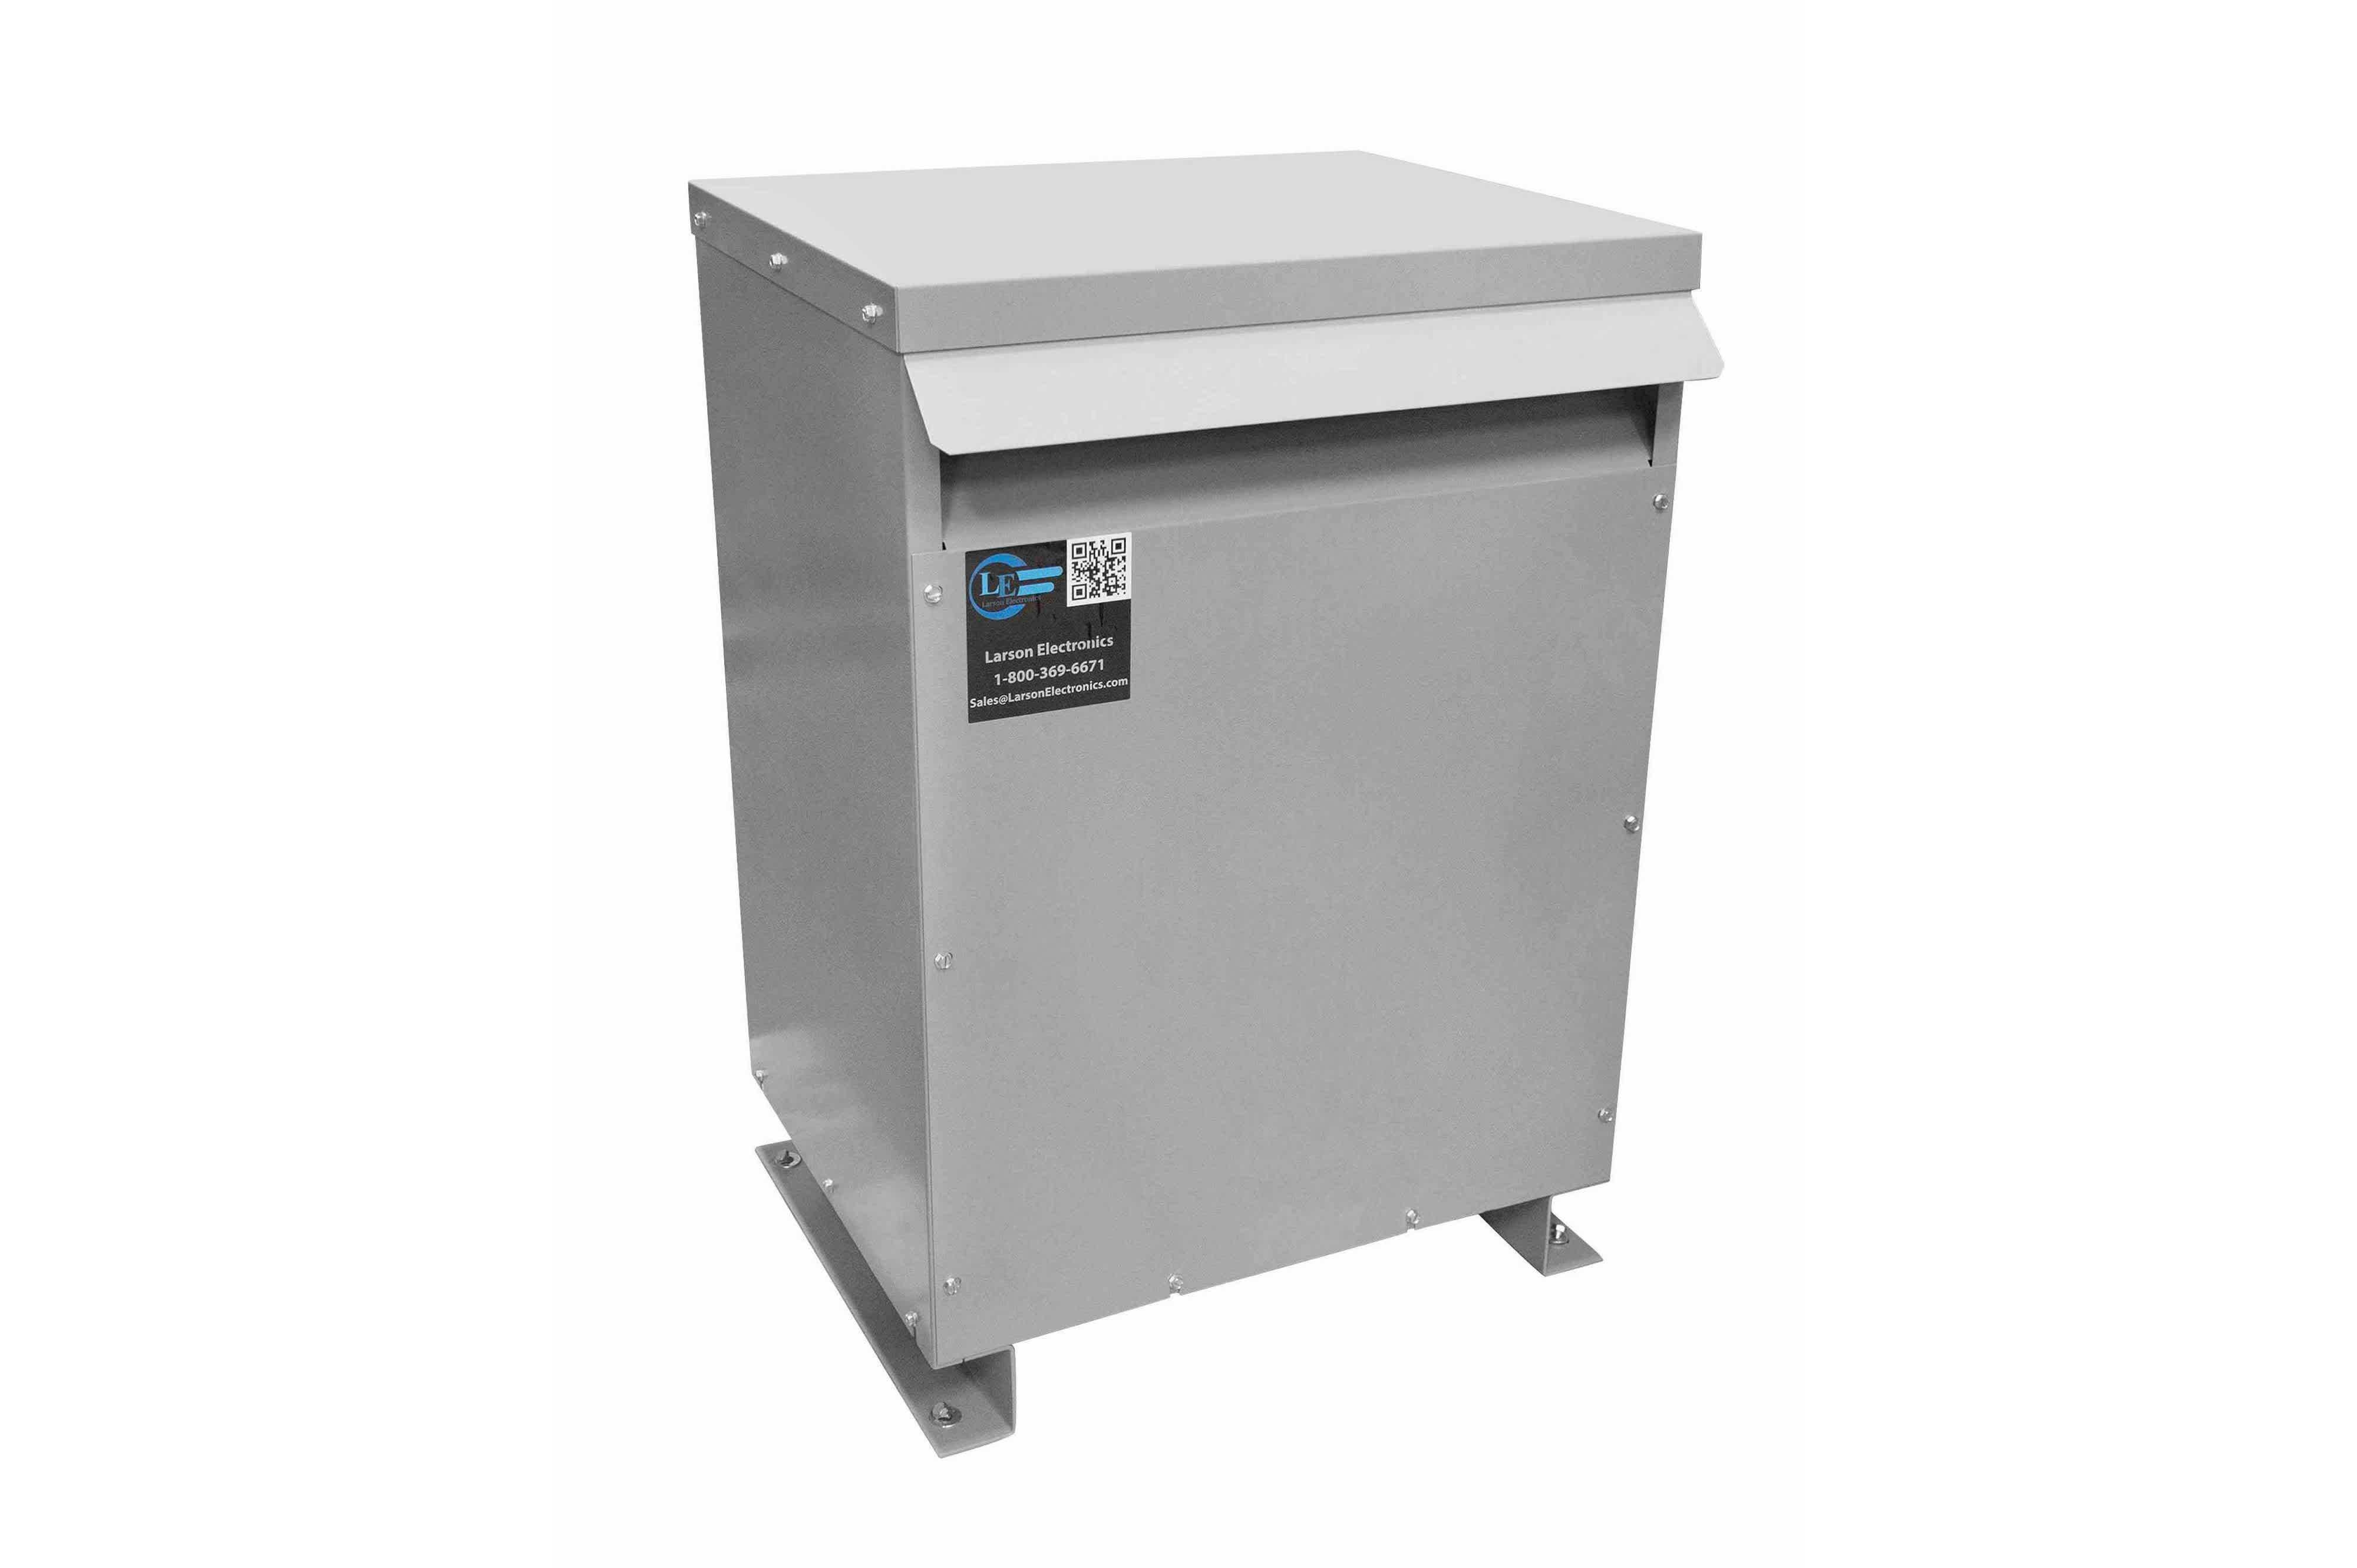 1000 kVA 3PH DOE Transformer, 220V Delta Primary, 208Y/120 Wye-N Secondary, N3R, Ventilated, 60 Hz